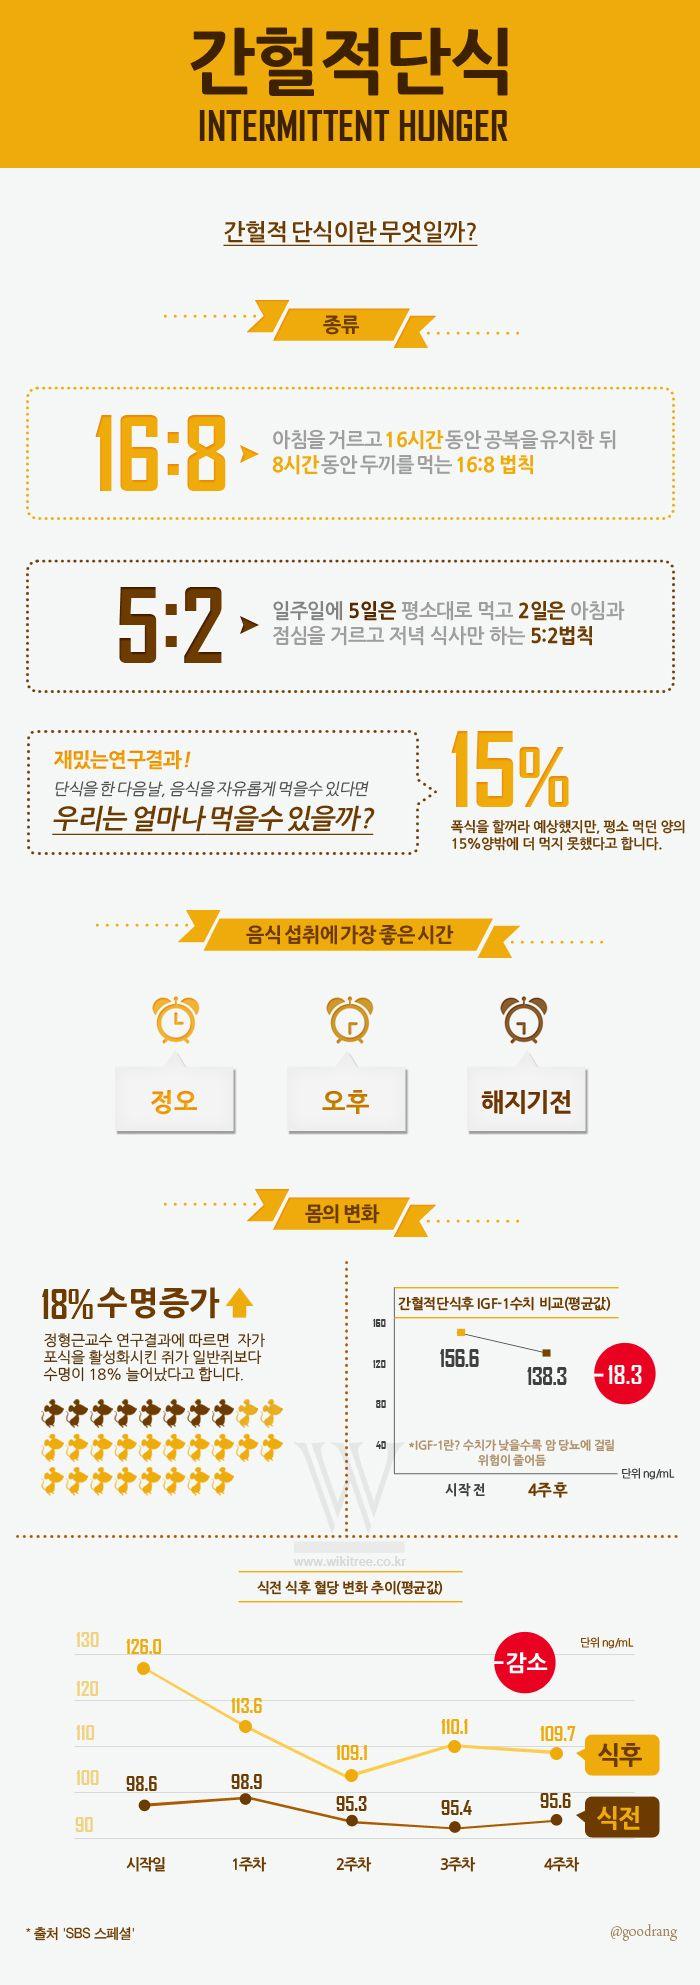 [Infographic] 간헐적 단식에 관한 인포그래픽